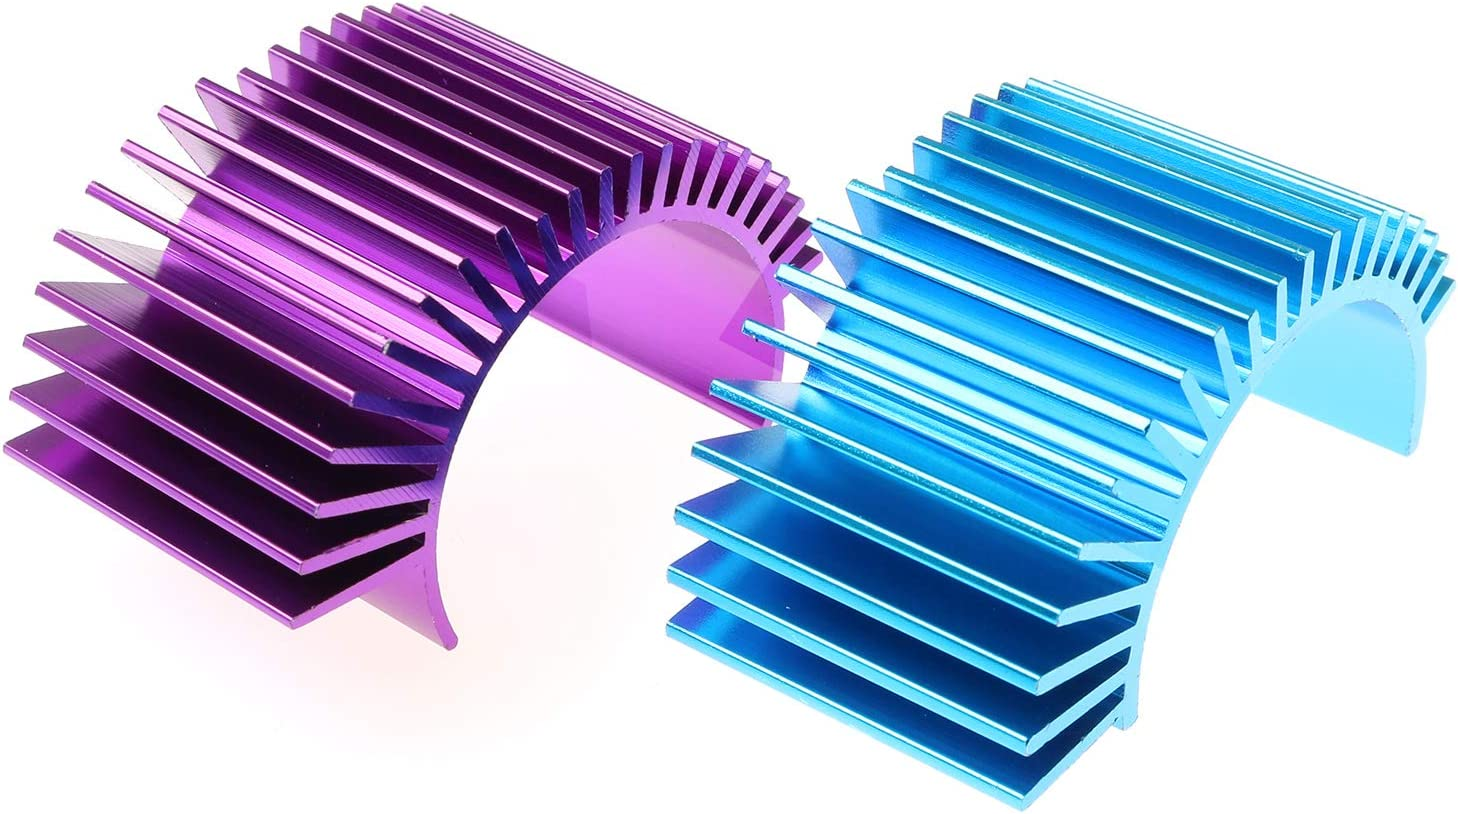 DGZZI Motor Heatsink 2PCS Racing Aluminum Electric Motor Heat Sink Radiator Cooling Fins for 540 550 3650 Motor RC Car Part